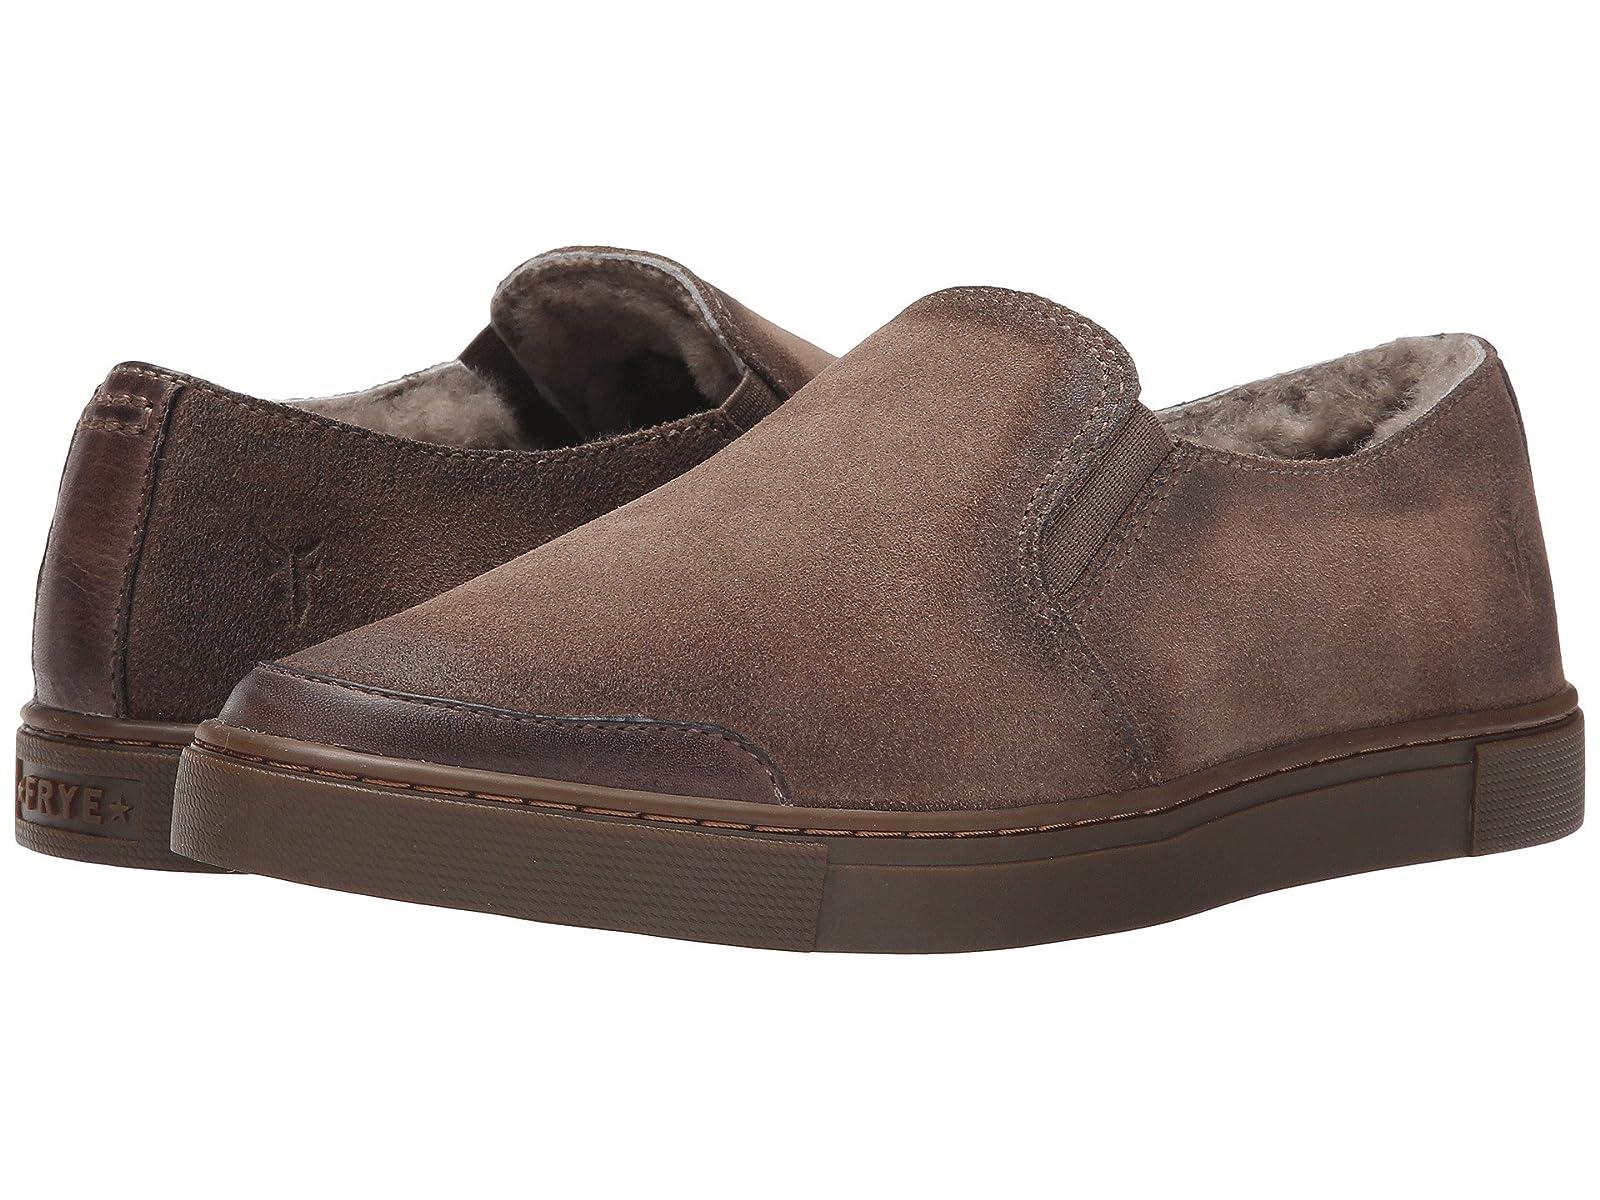 Frye Gemma Slip ShearlingCheap and distinctive eye-catching shoes